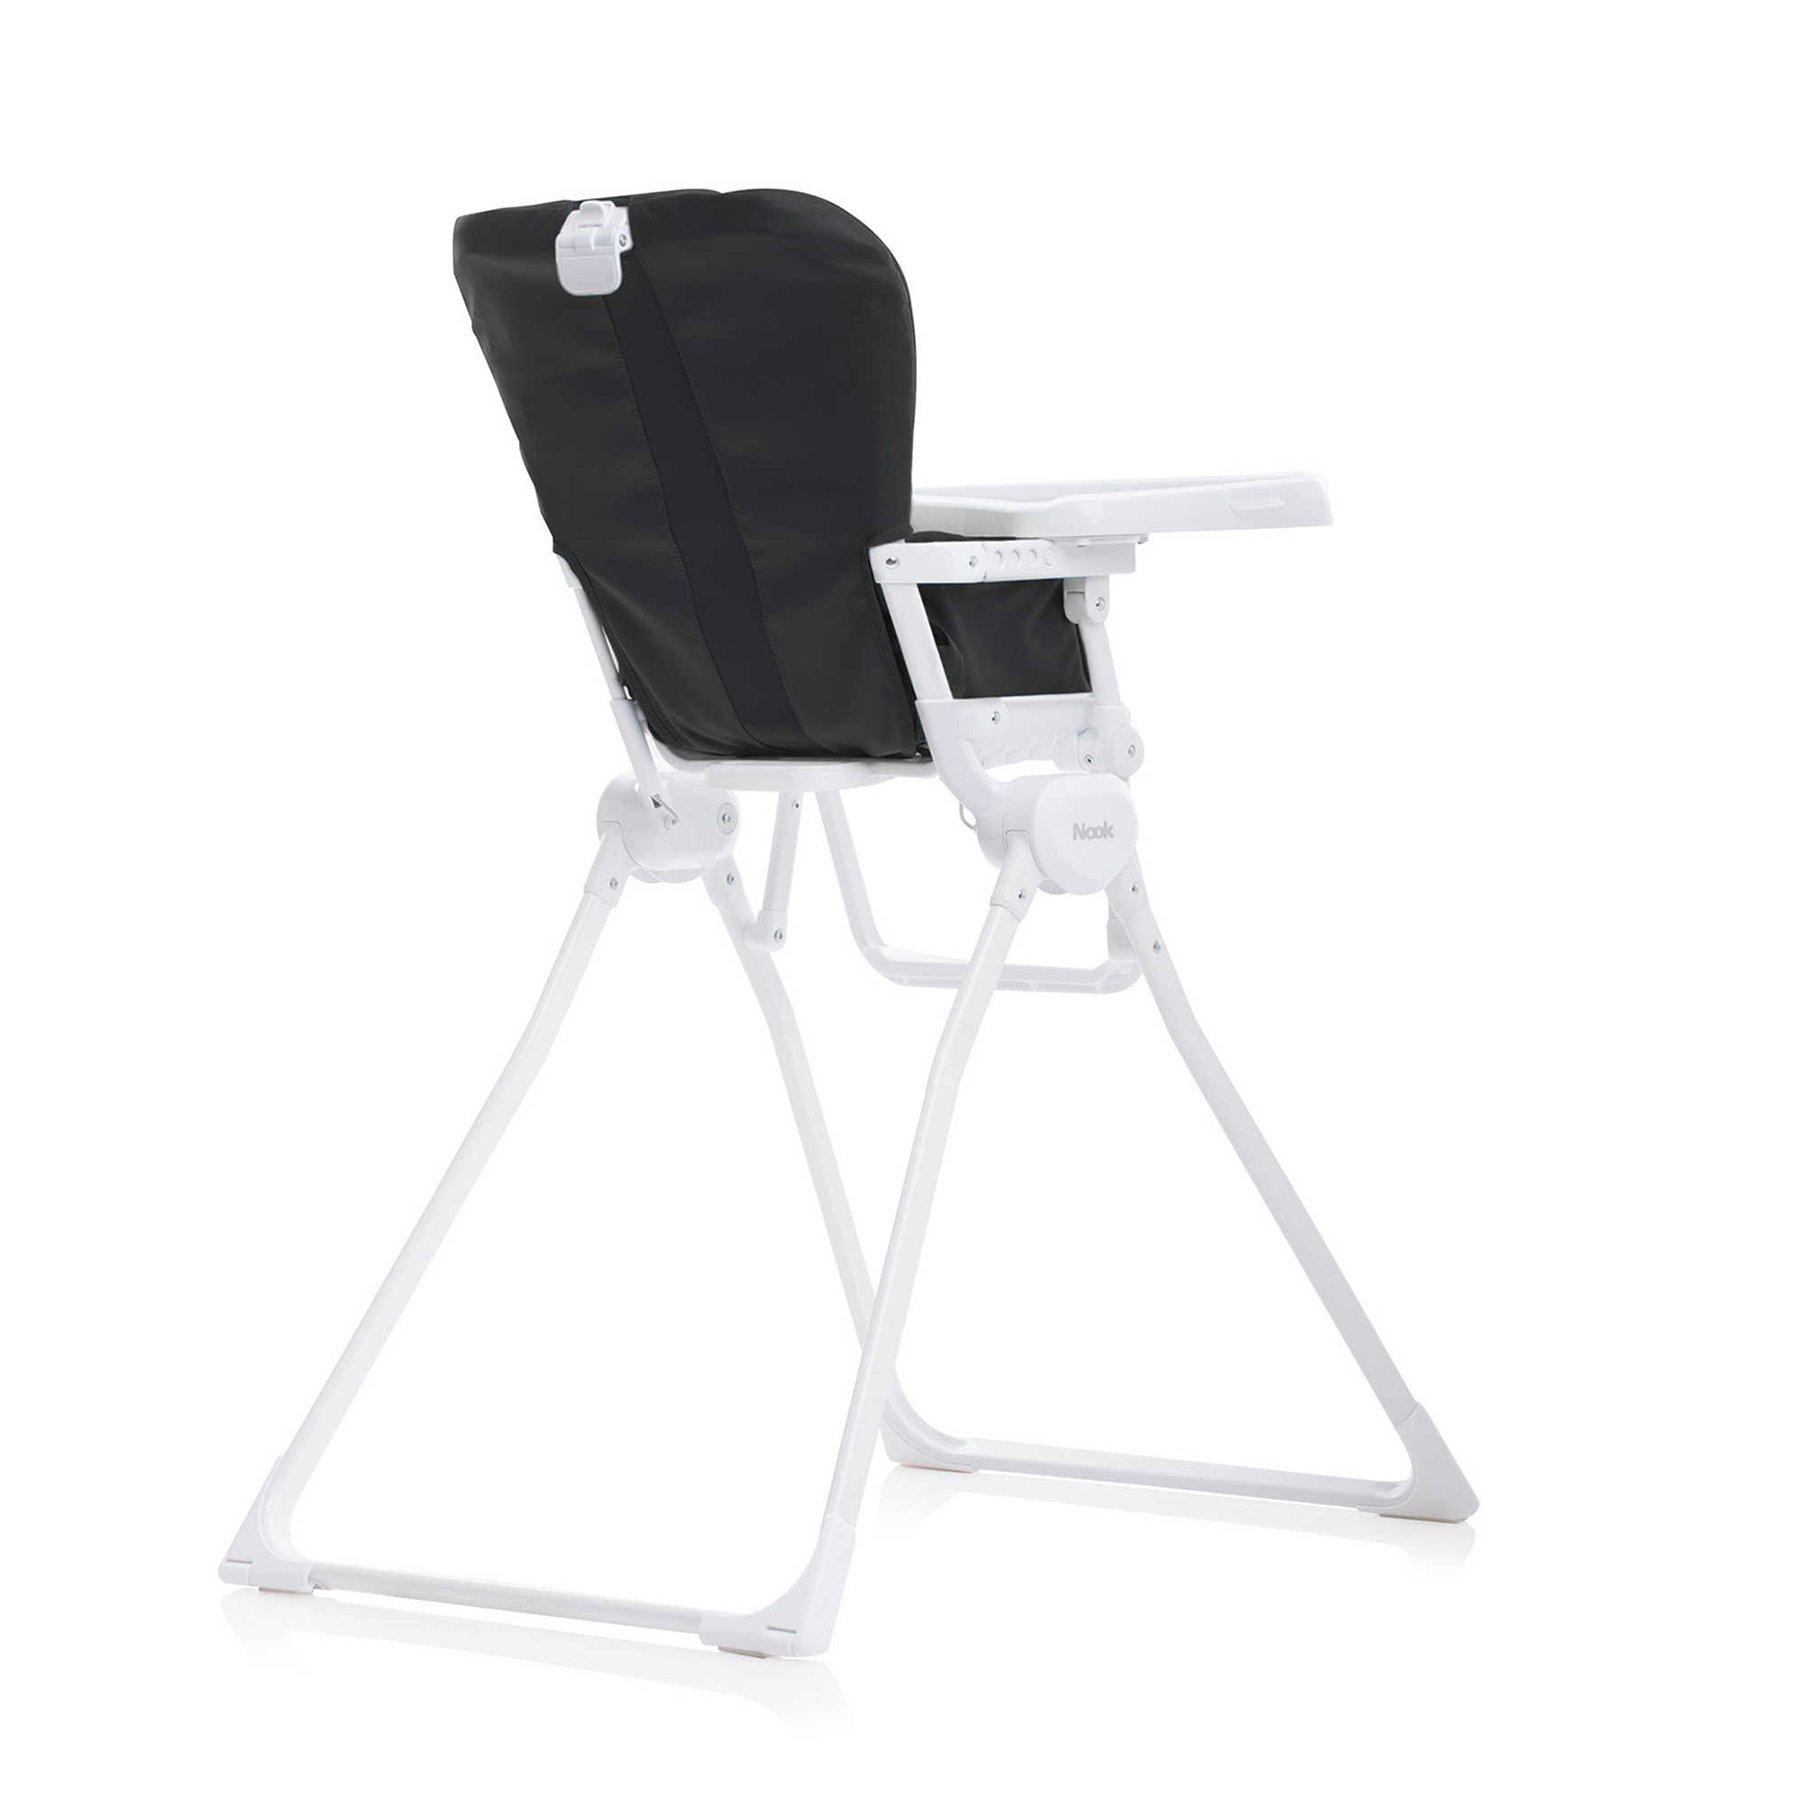 JOOVY Nook High Chair,  Black